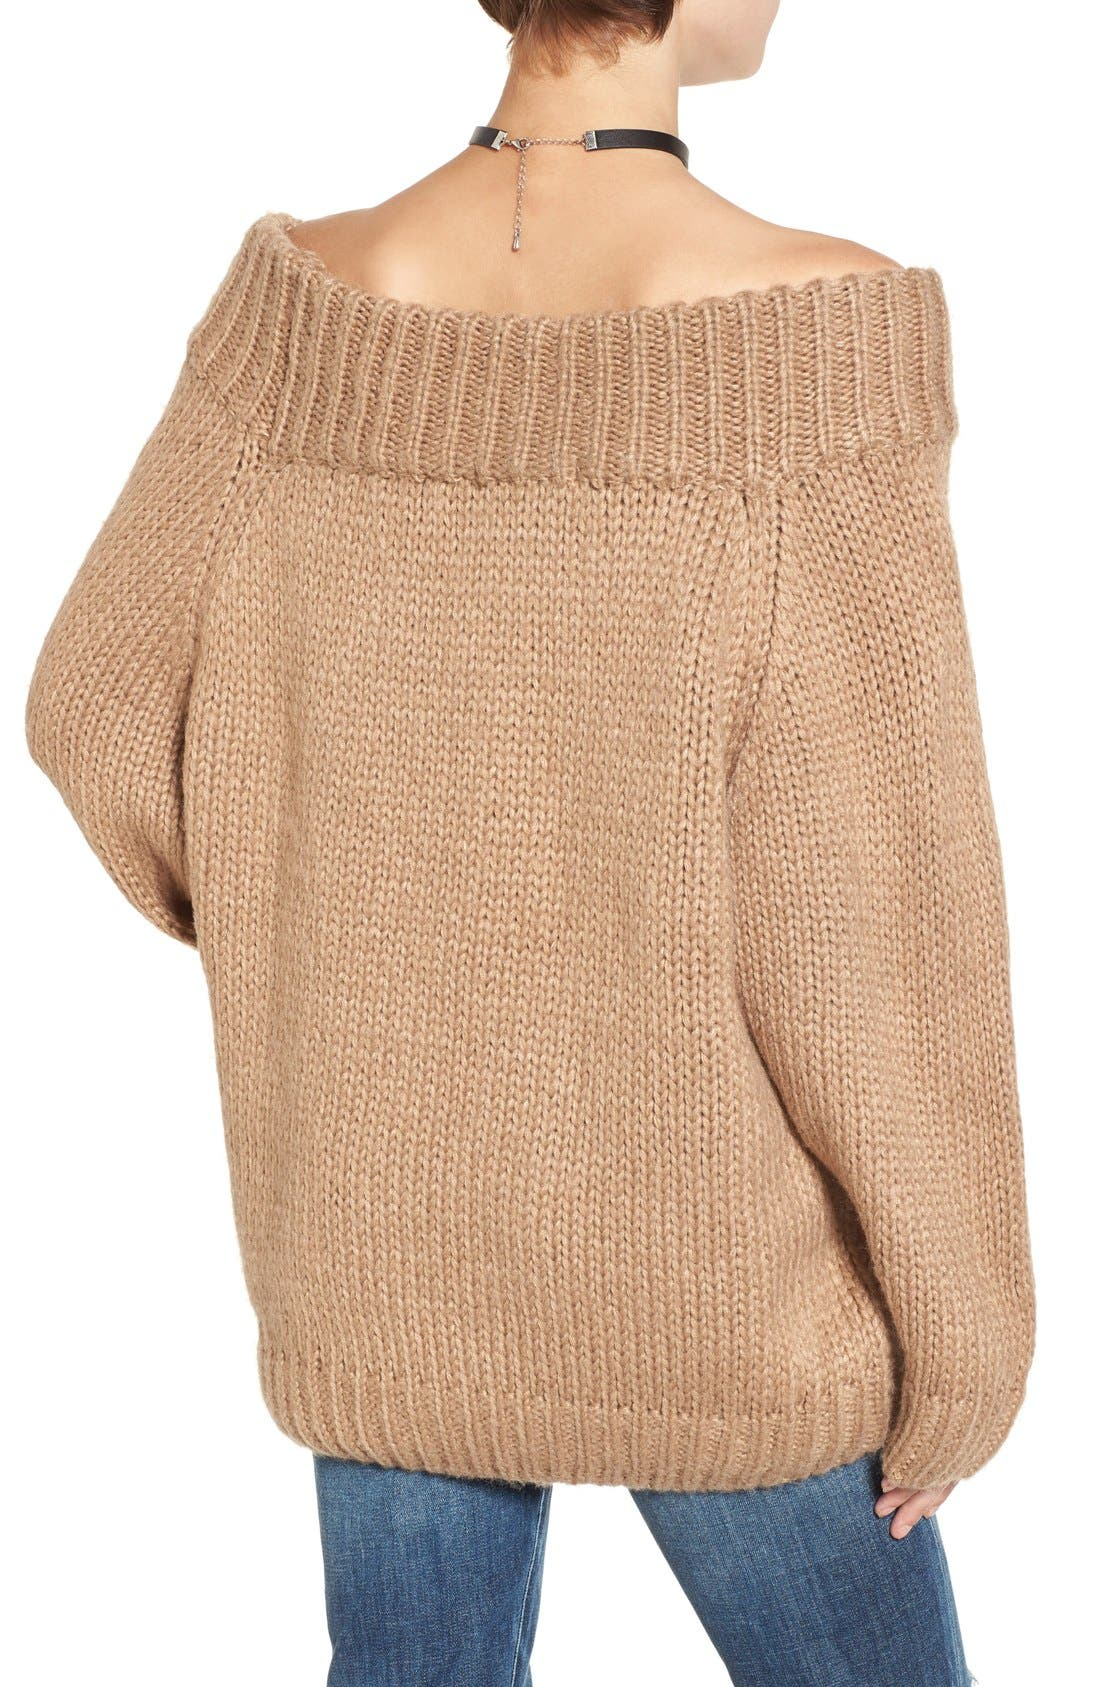 Alternate Image 3  - Cotton Emporium Off the Shoulder Knit Pullover